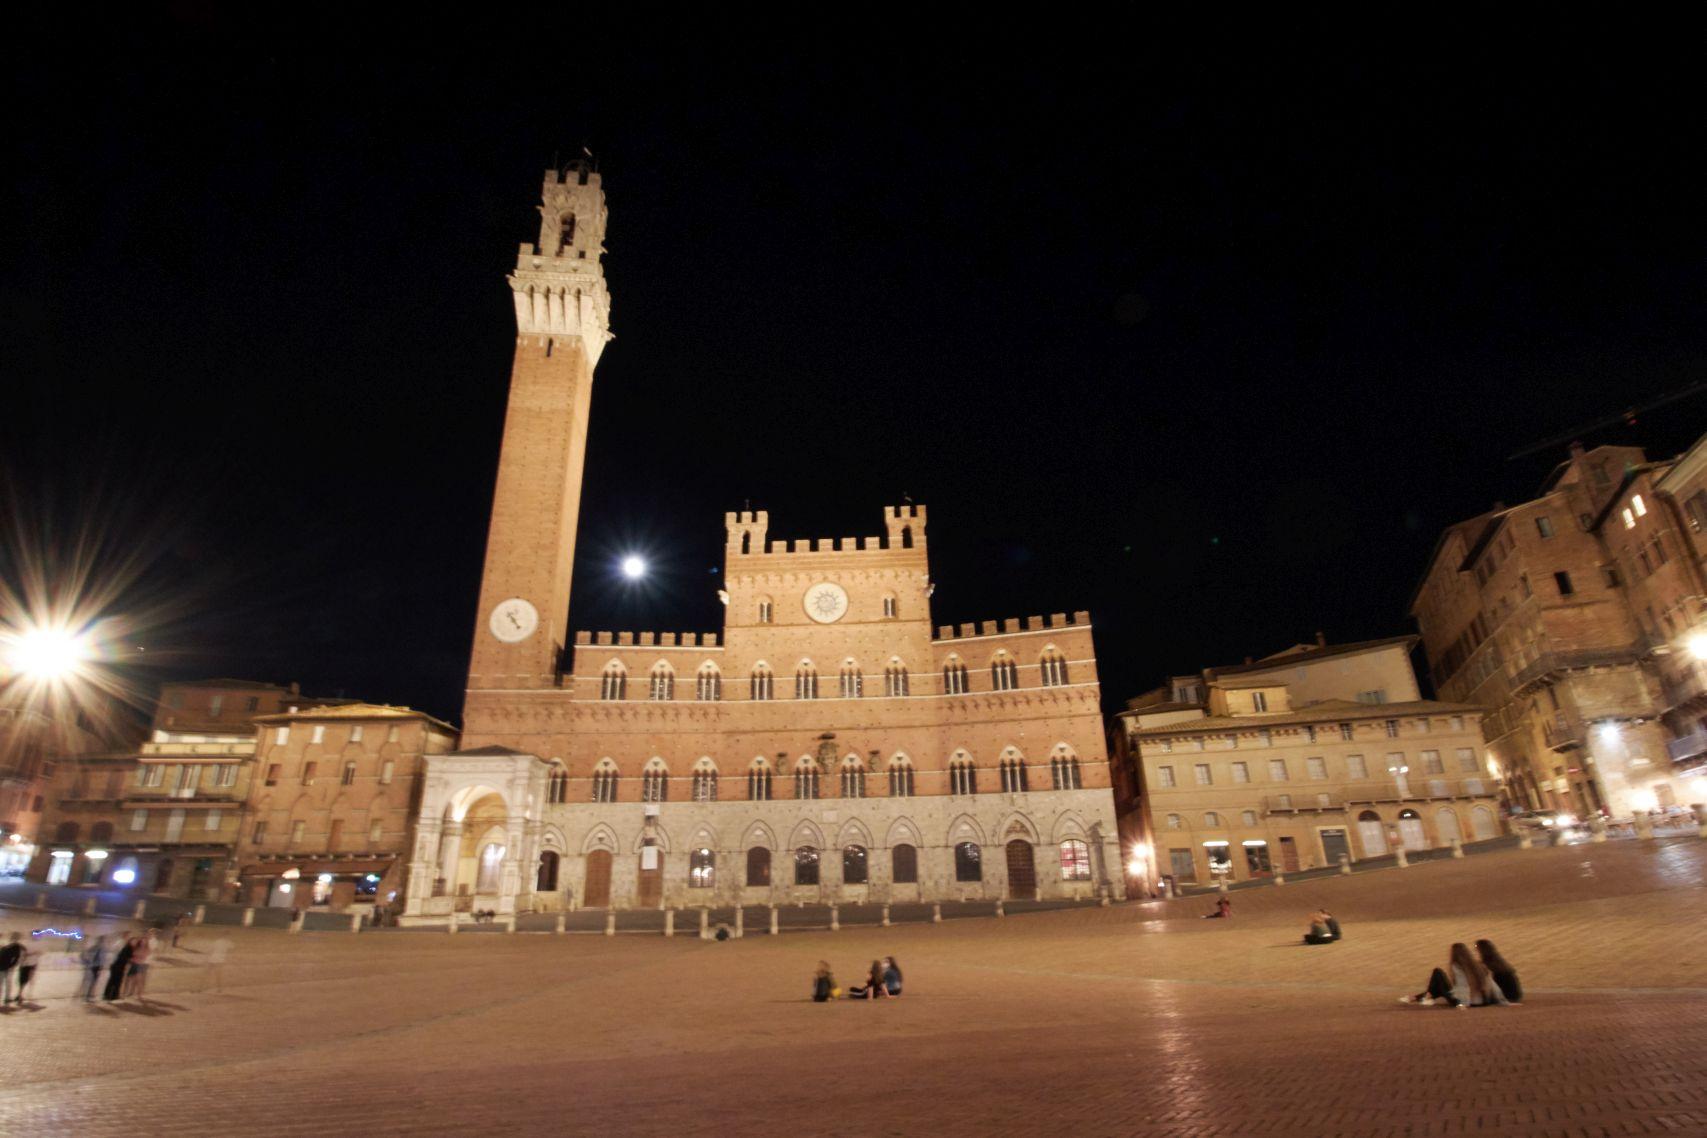 Torre del Mangia auf der Piazza del Campo in Siena als Stopp vom Toskana Roadtrip